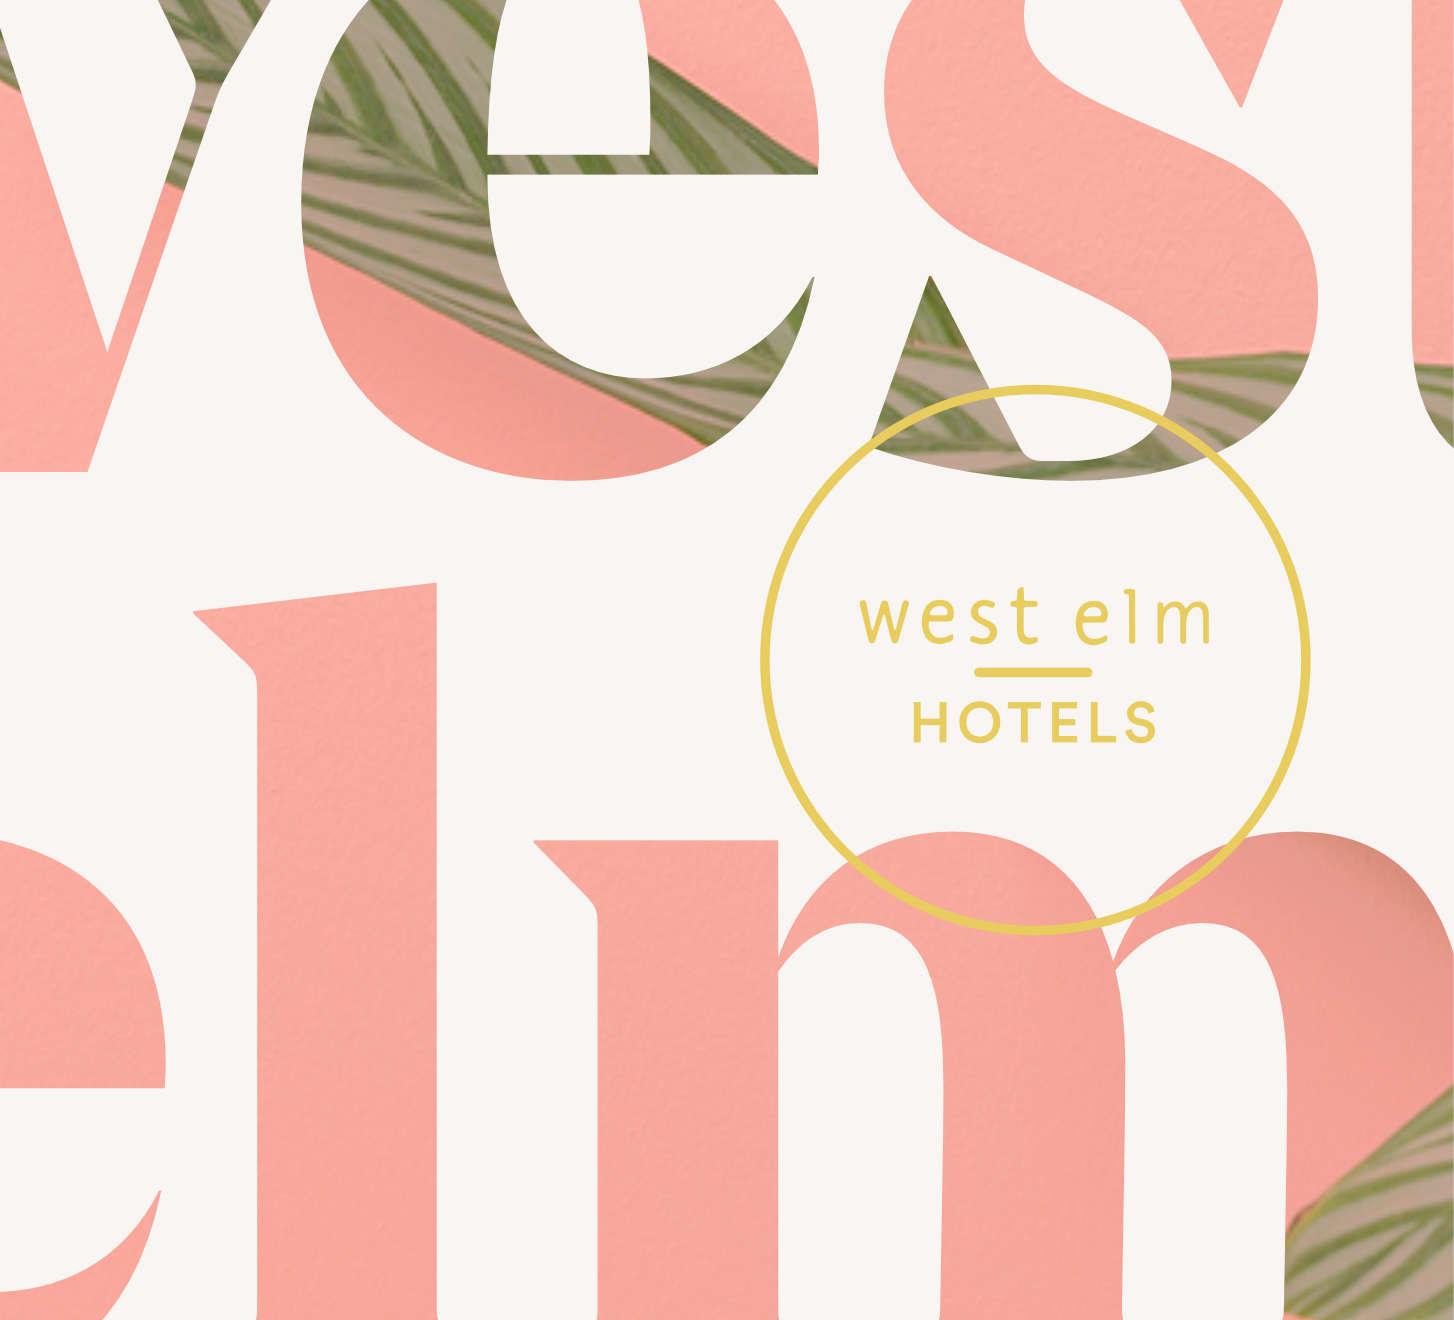 west elm Hotels